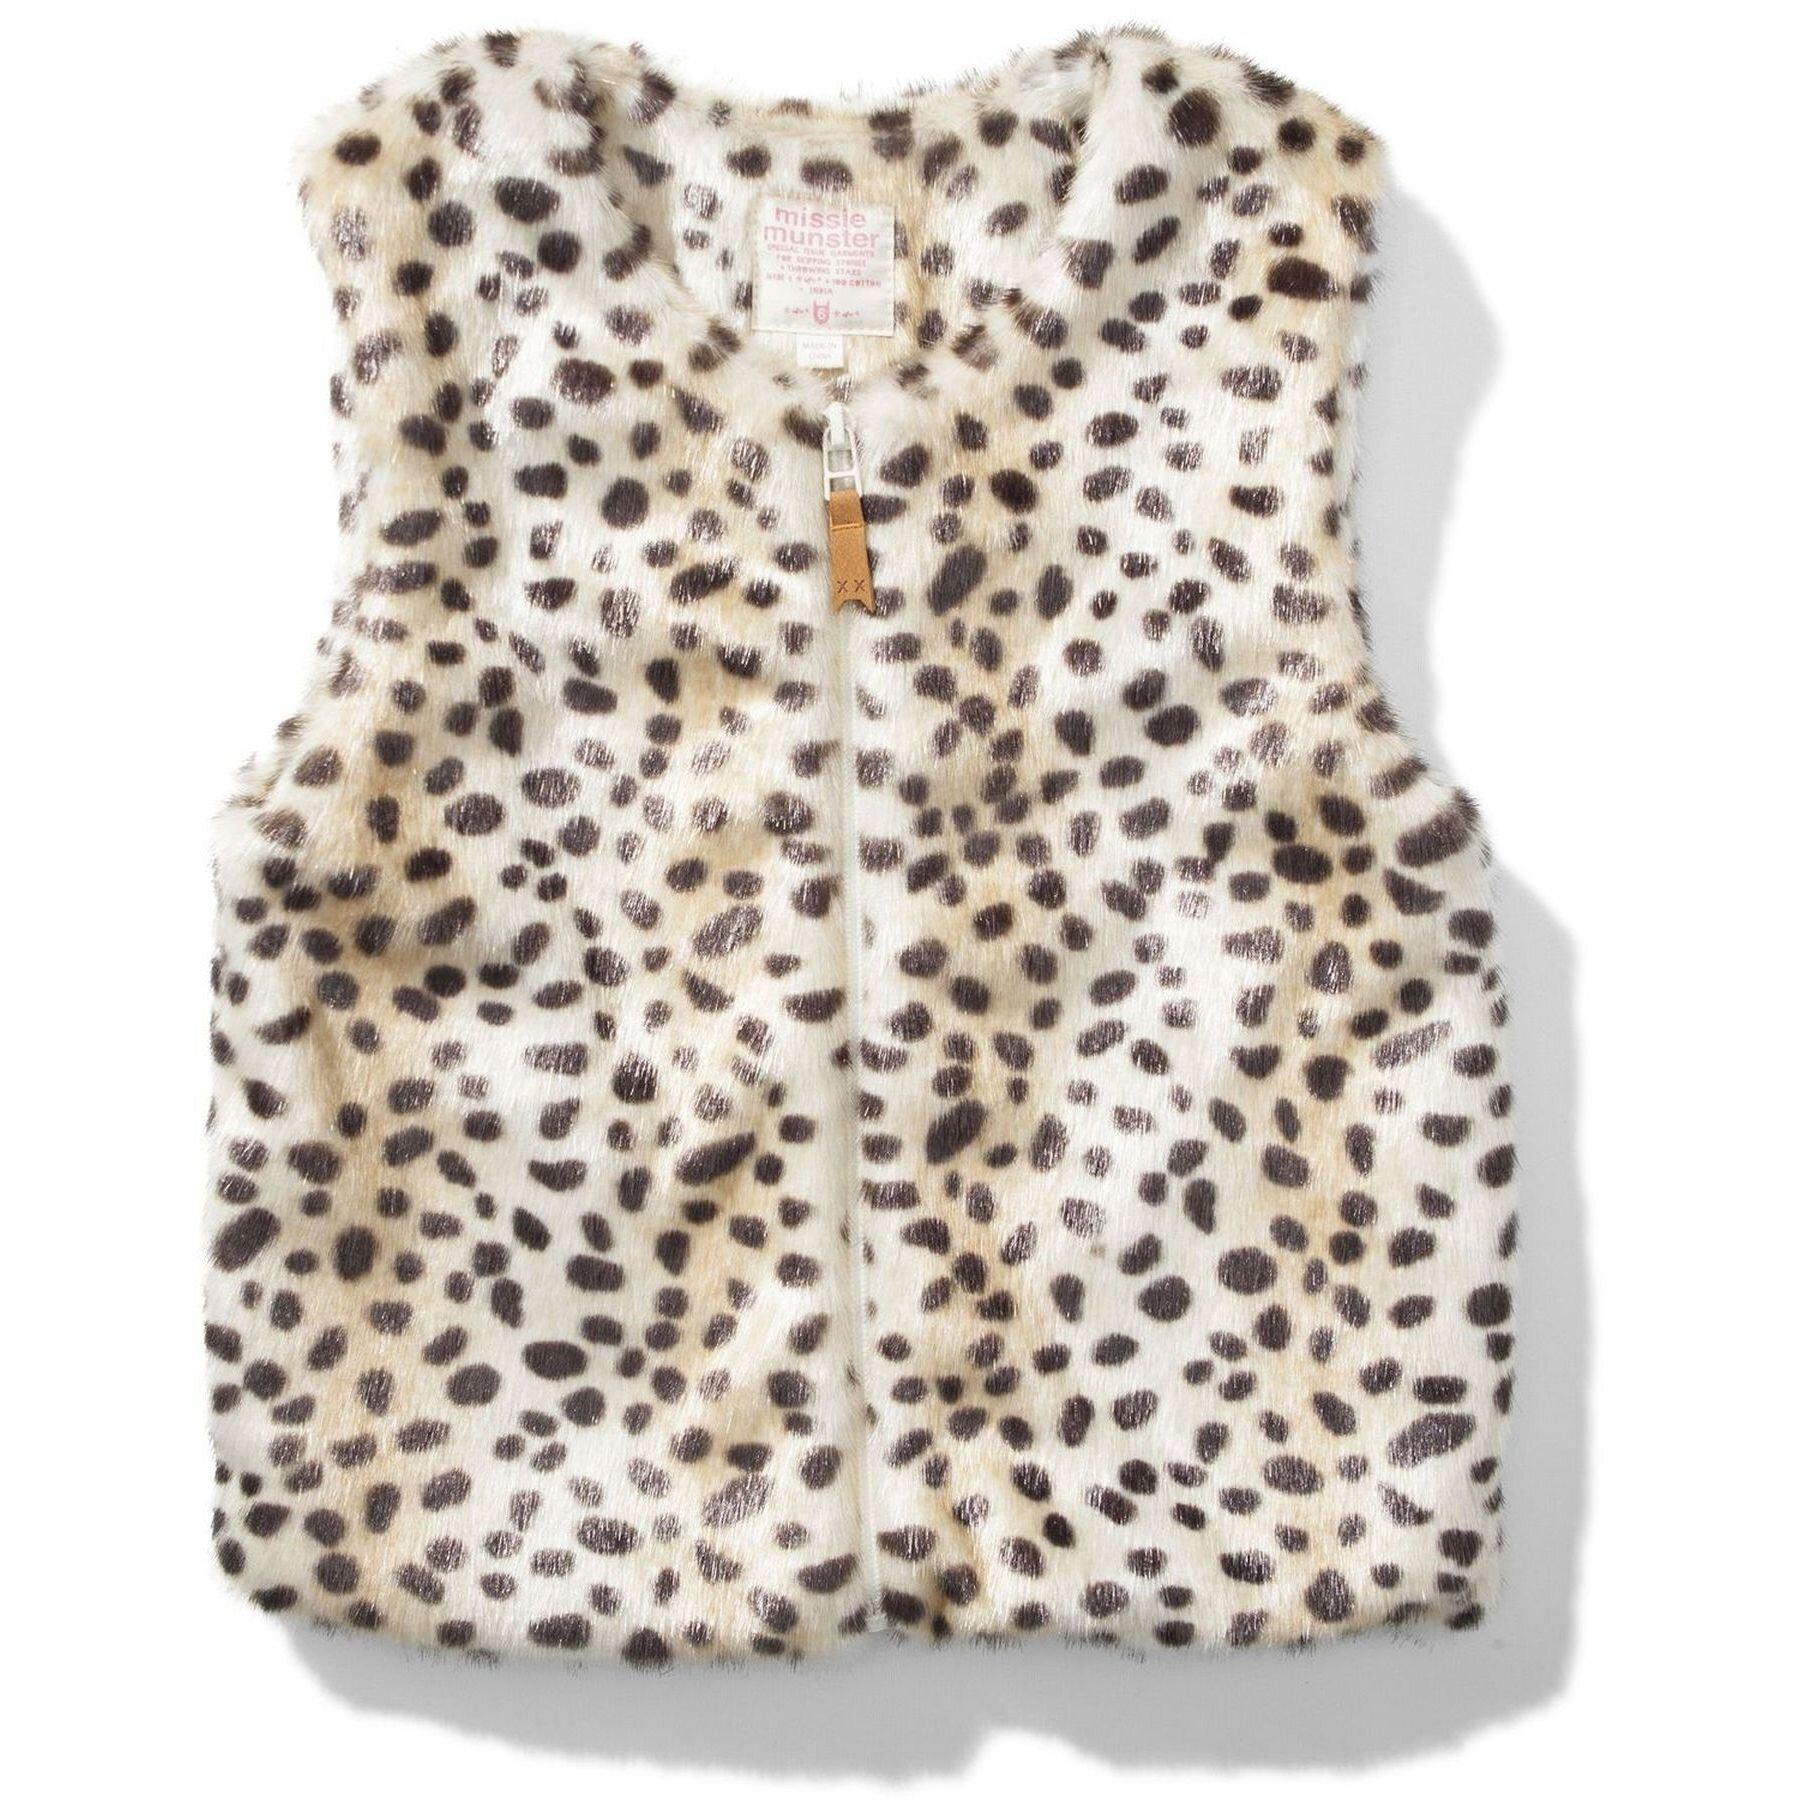 f9b8c189f Missie Munster Surfari Faux Fur Vest - Cheetah - CLOTHING-GIRL-Girls ...